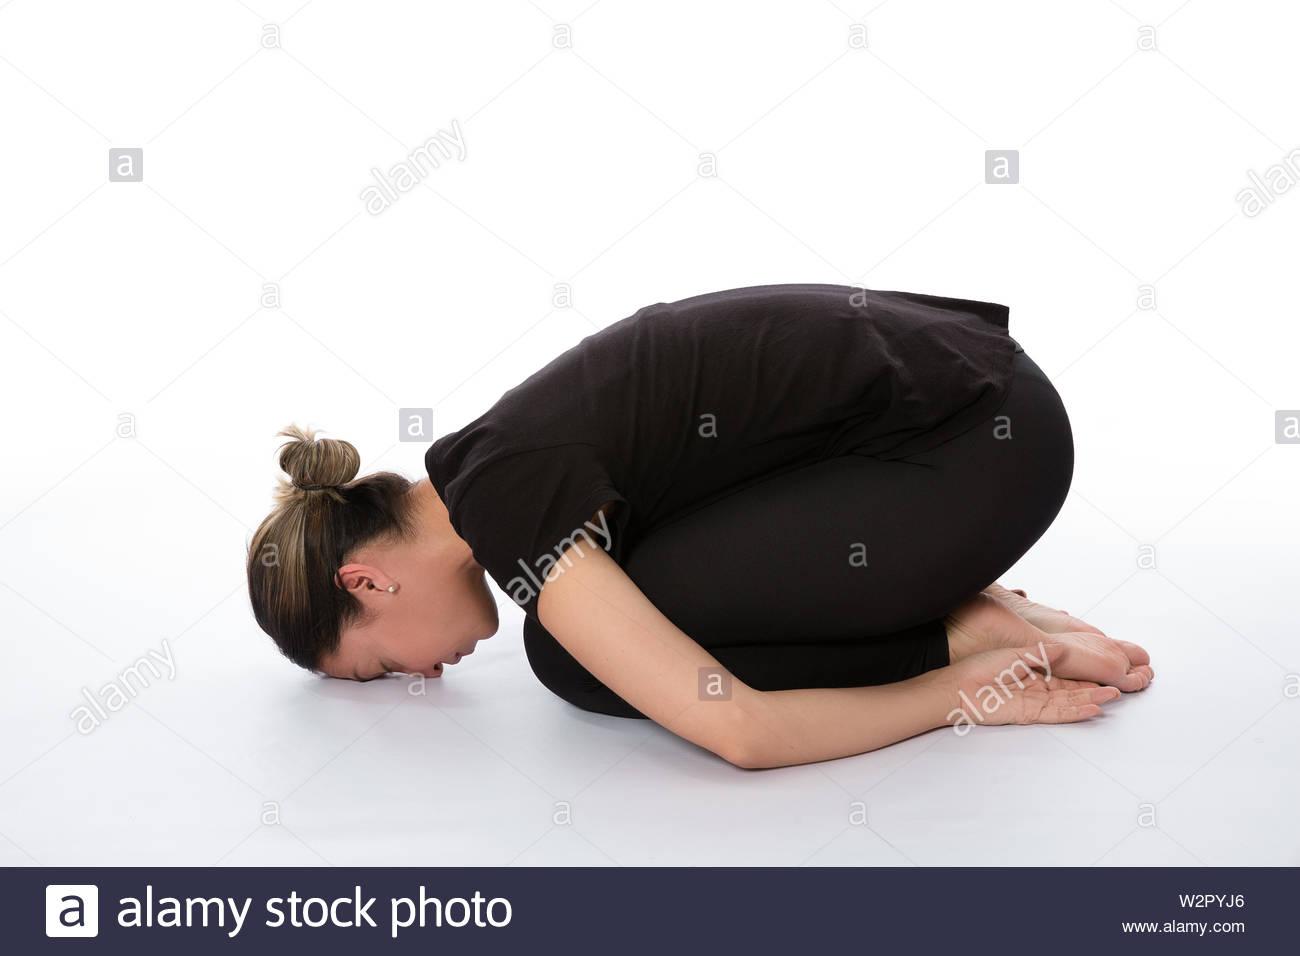 Balasana pose (Child pose). Yoga poses woman isolated with white background. Yoga pose set. Mindfulness and Spiritually concept. Girl practicing Hatha - Stock Image